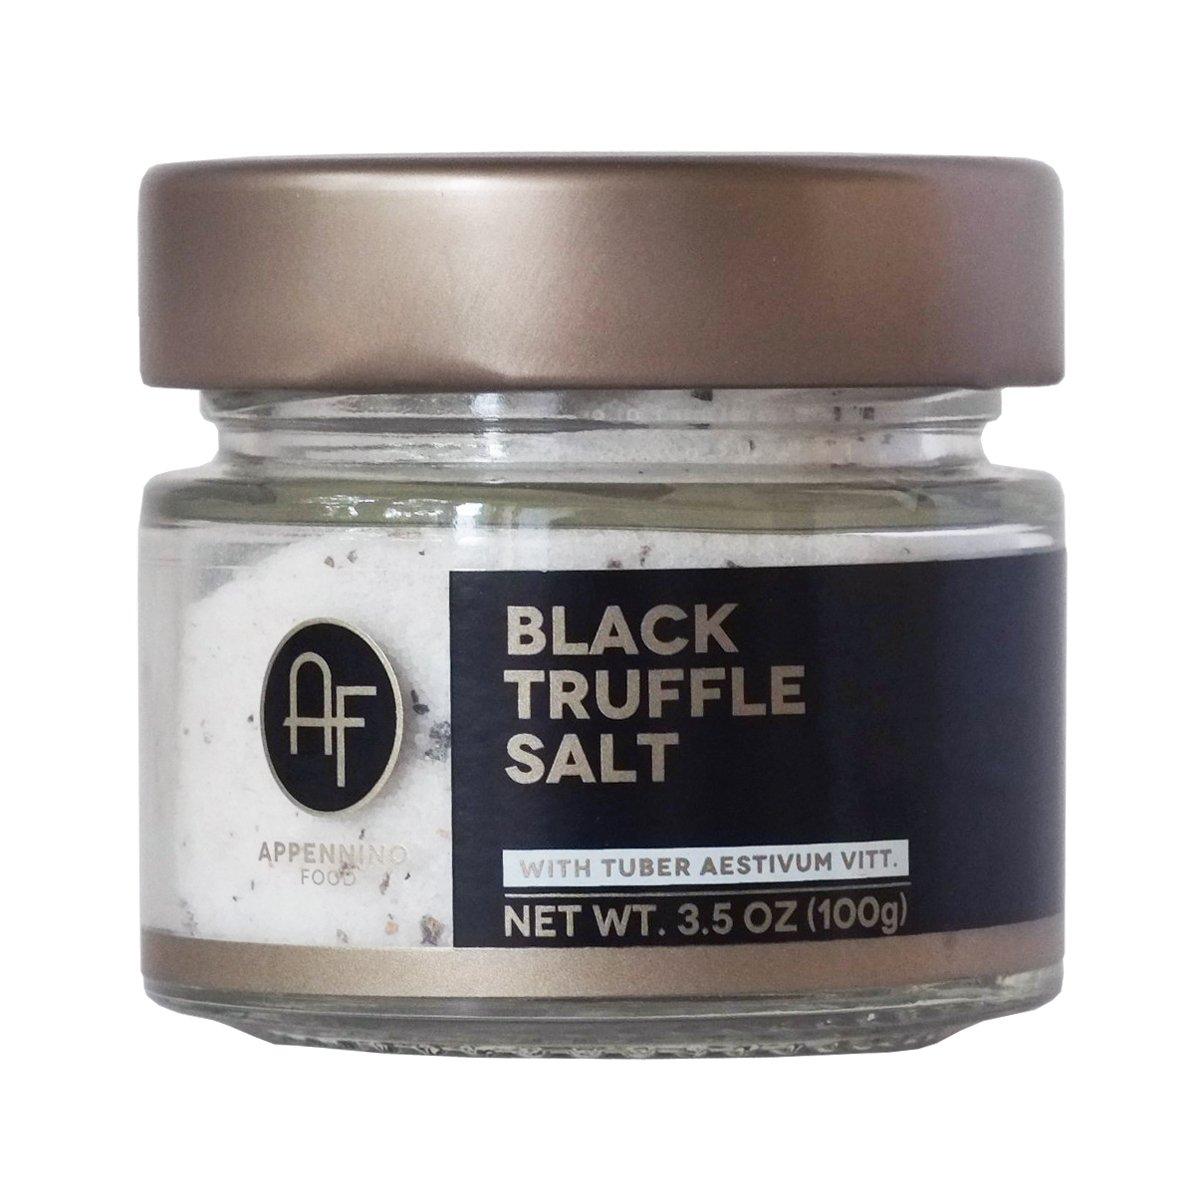 Appennino Italian Truffle Salt 3.5 oz